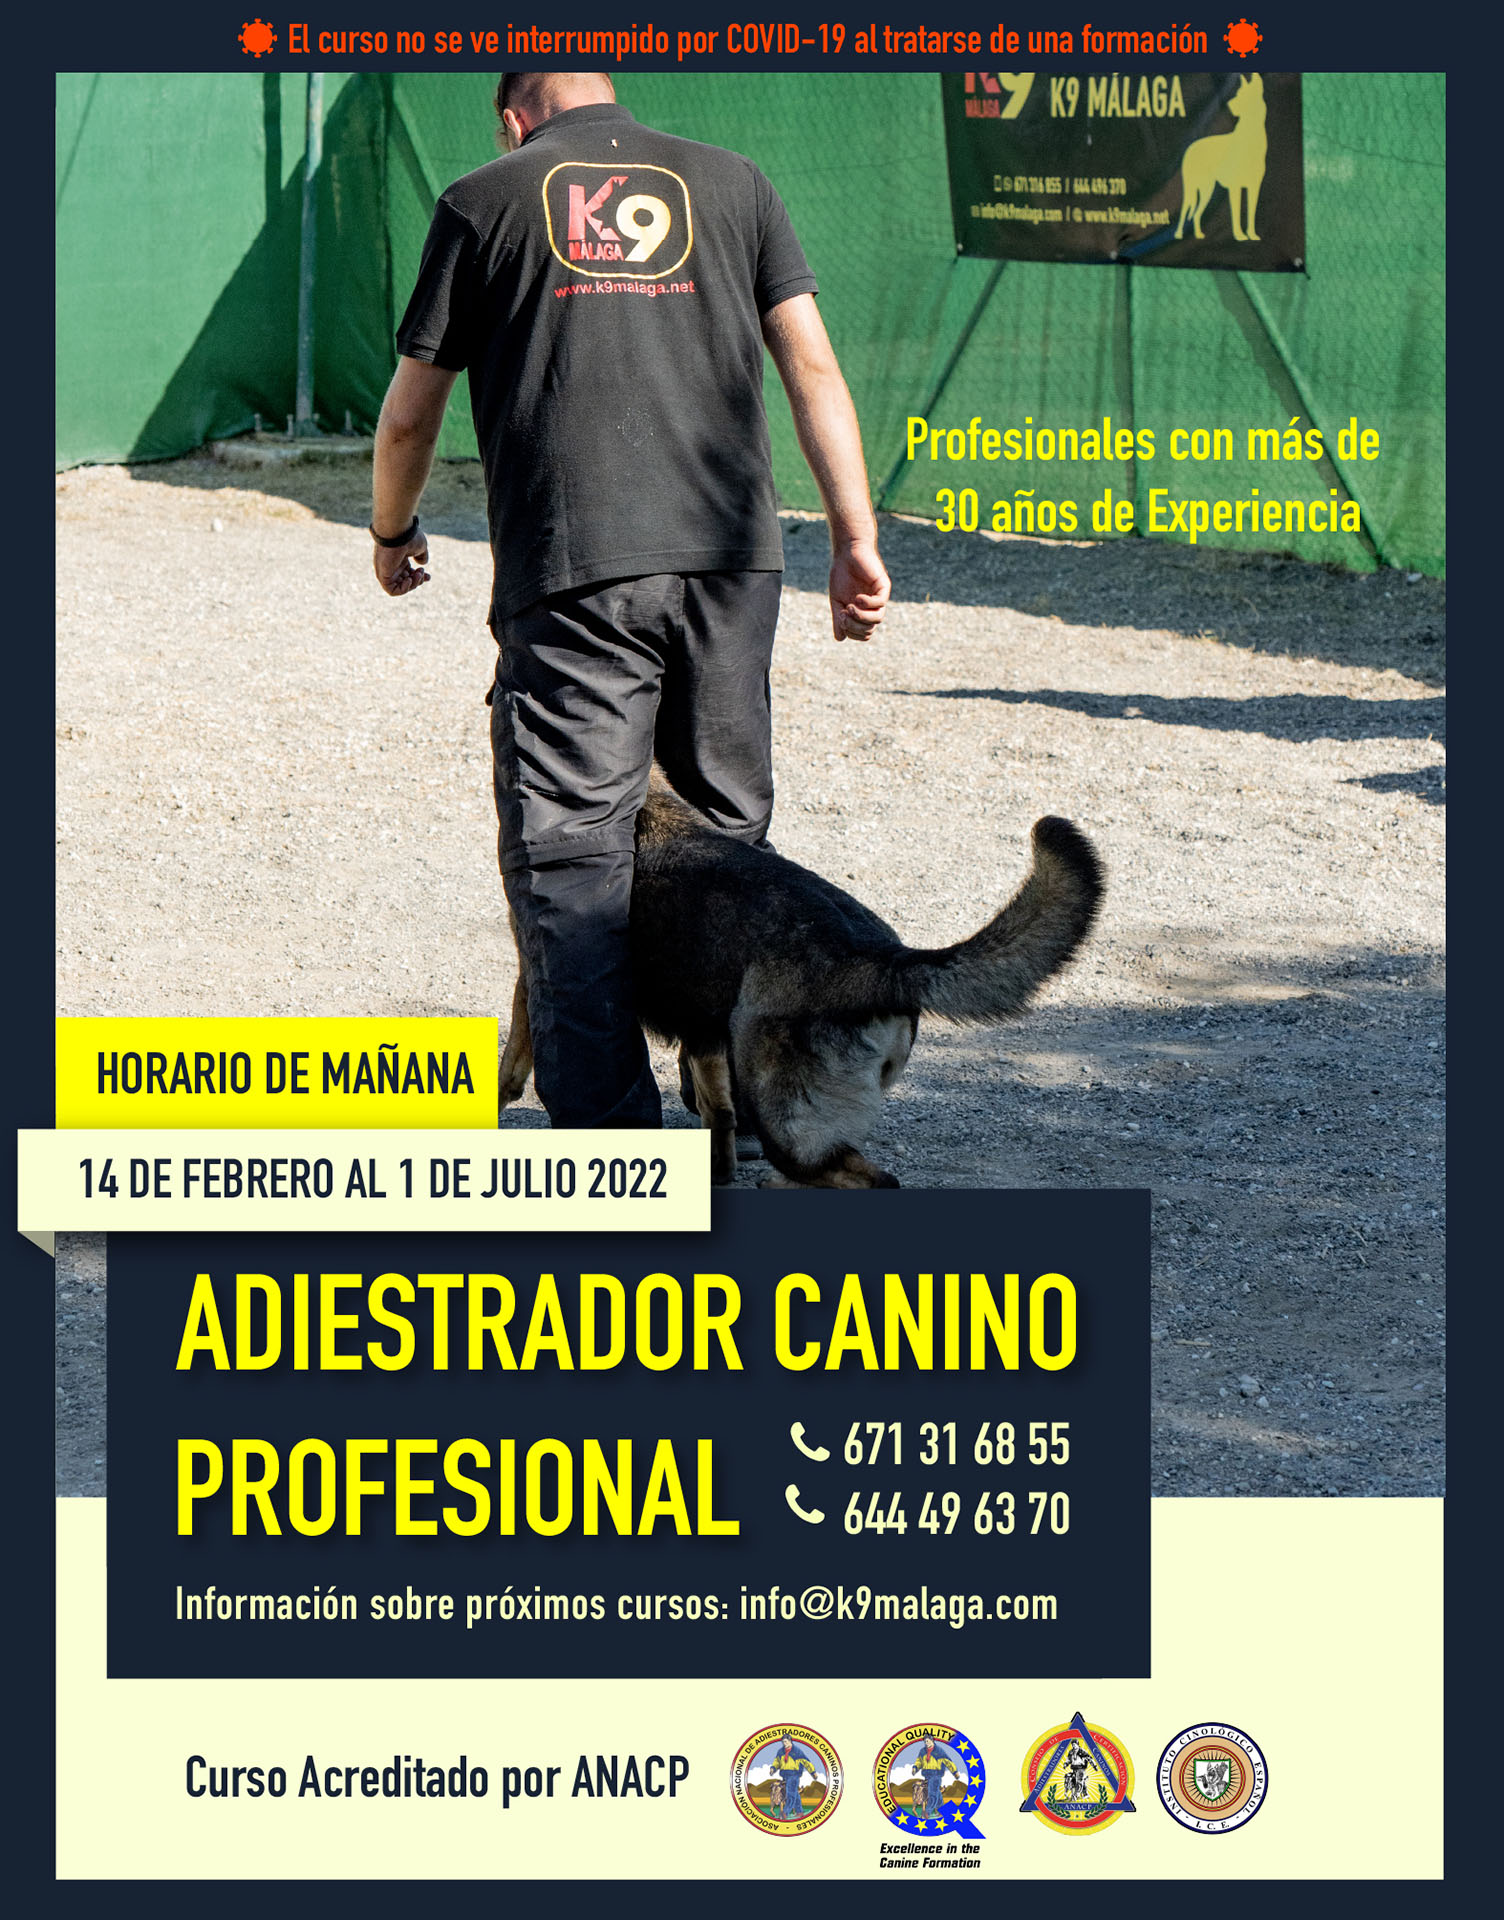 Curso Adiestrador Canino Profesional K9 Málaga 2022. Acreditado por ANACP.